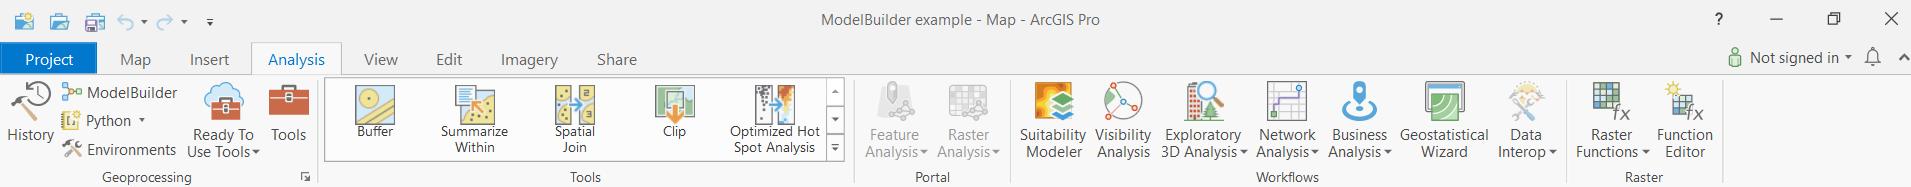 Where to find ModelBuilder tab